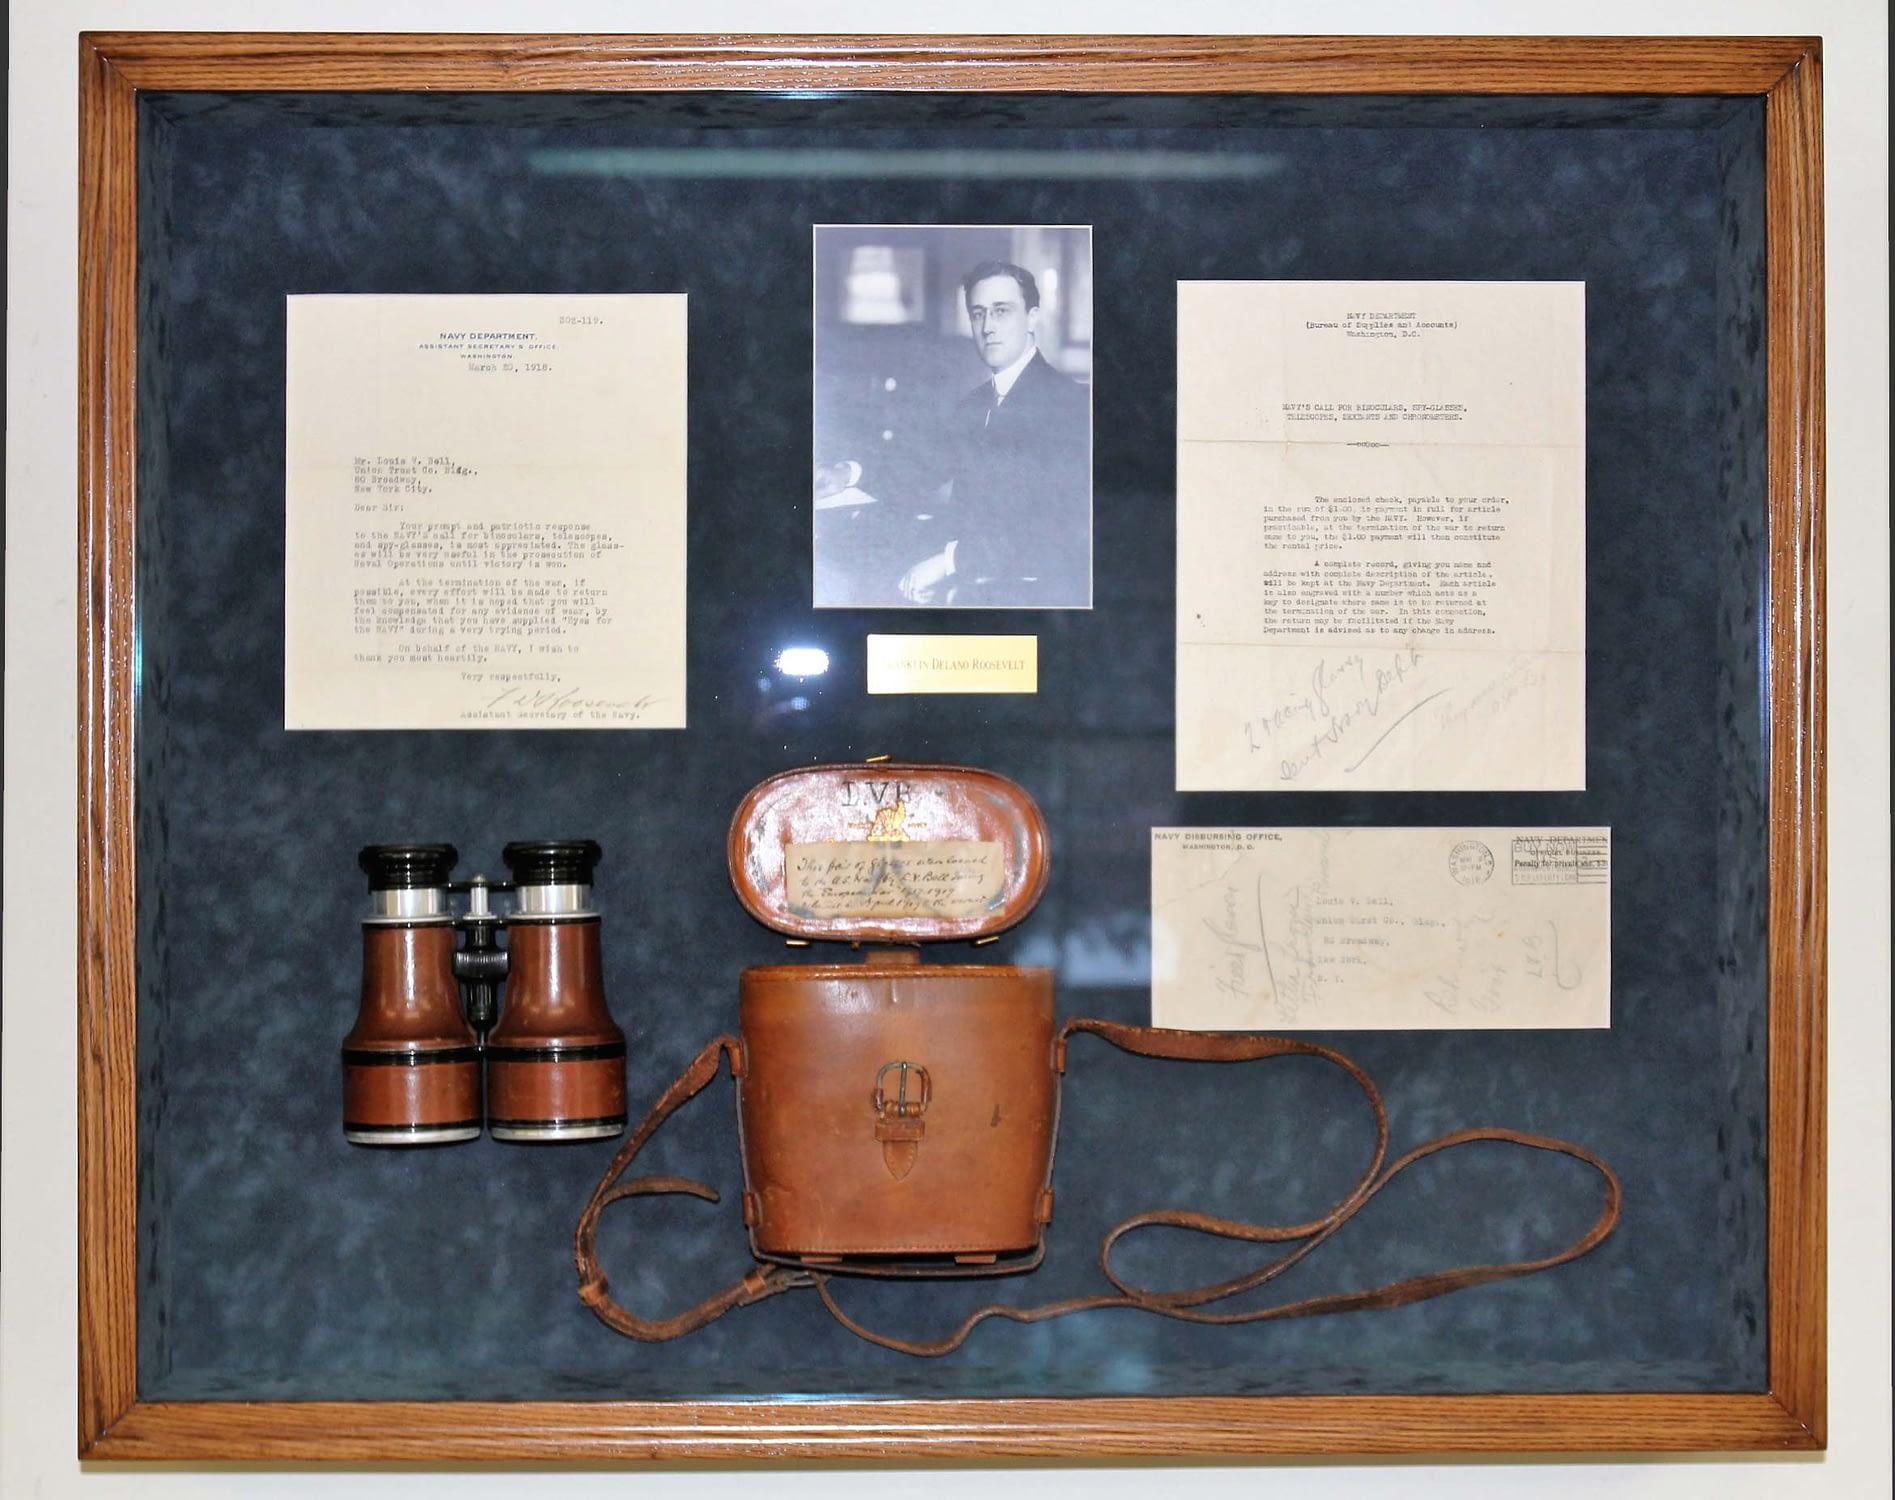 Framed memorabilia with a wooden frame